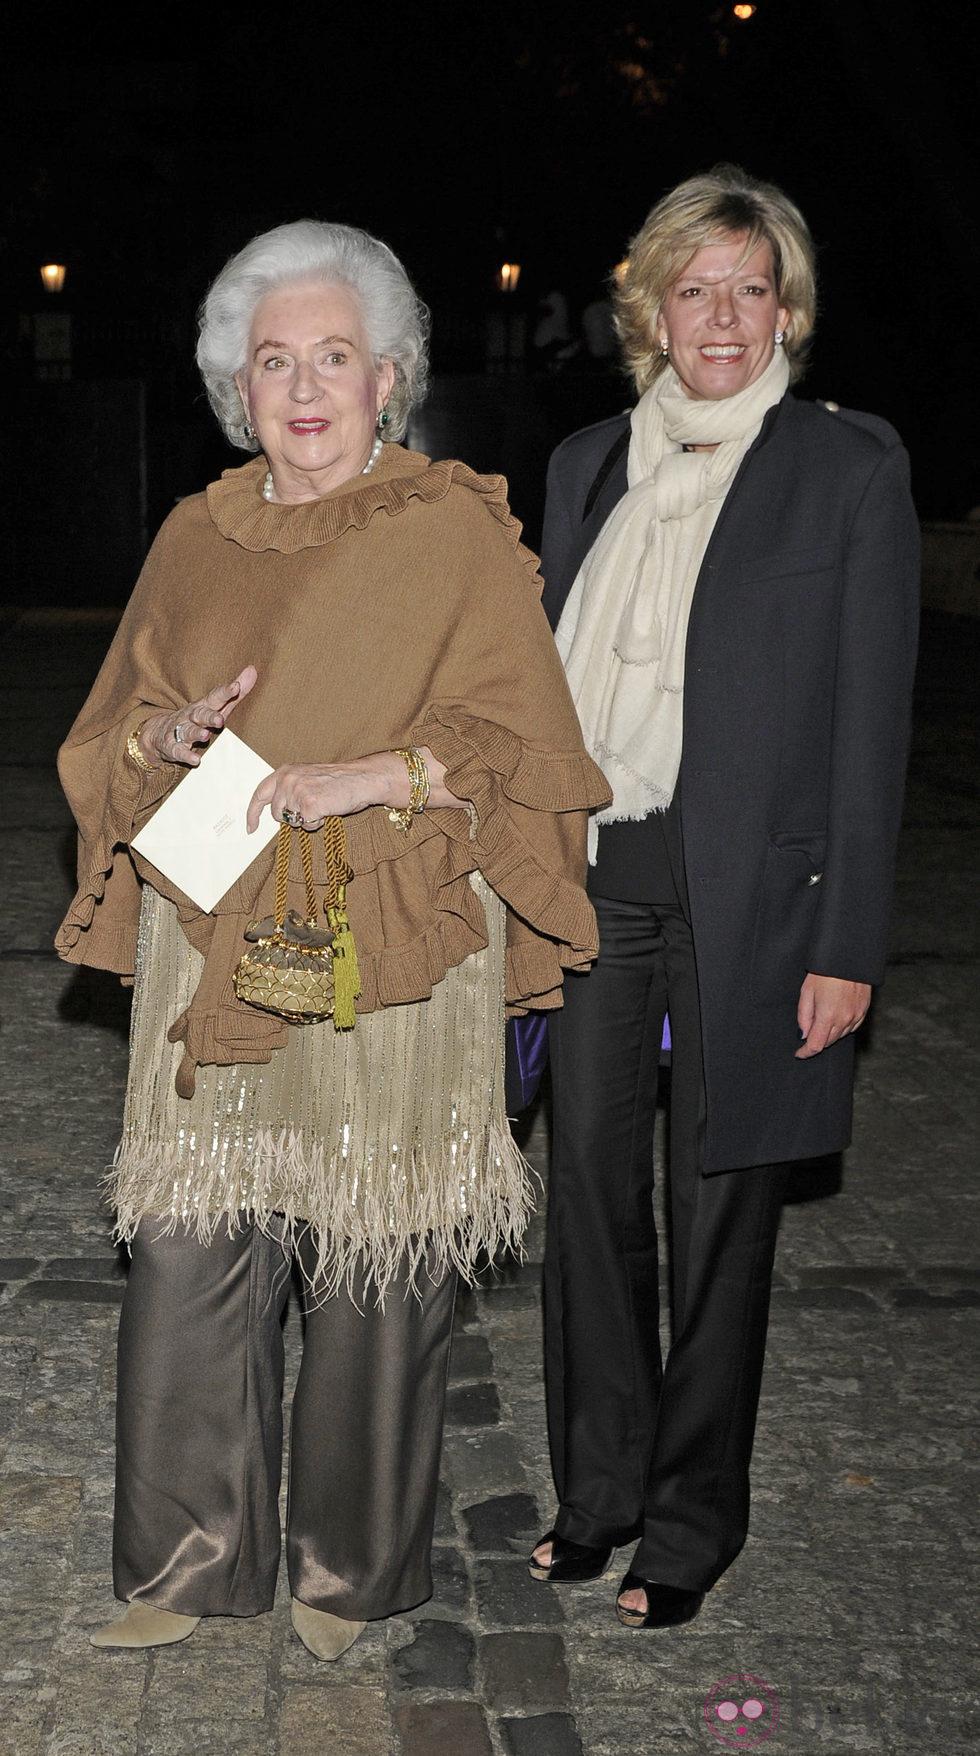 Pilar de Borbón y Luis Gómez-Acebo - Página 7 49555_infanta-pilar-simoneta-gomez-acebo-cena-benefica-asociacion-nuevo-futuro